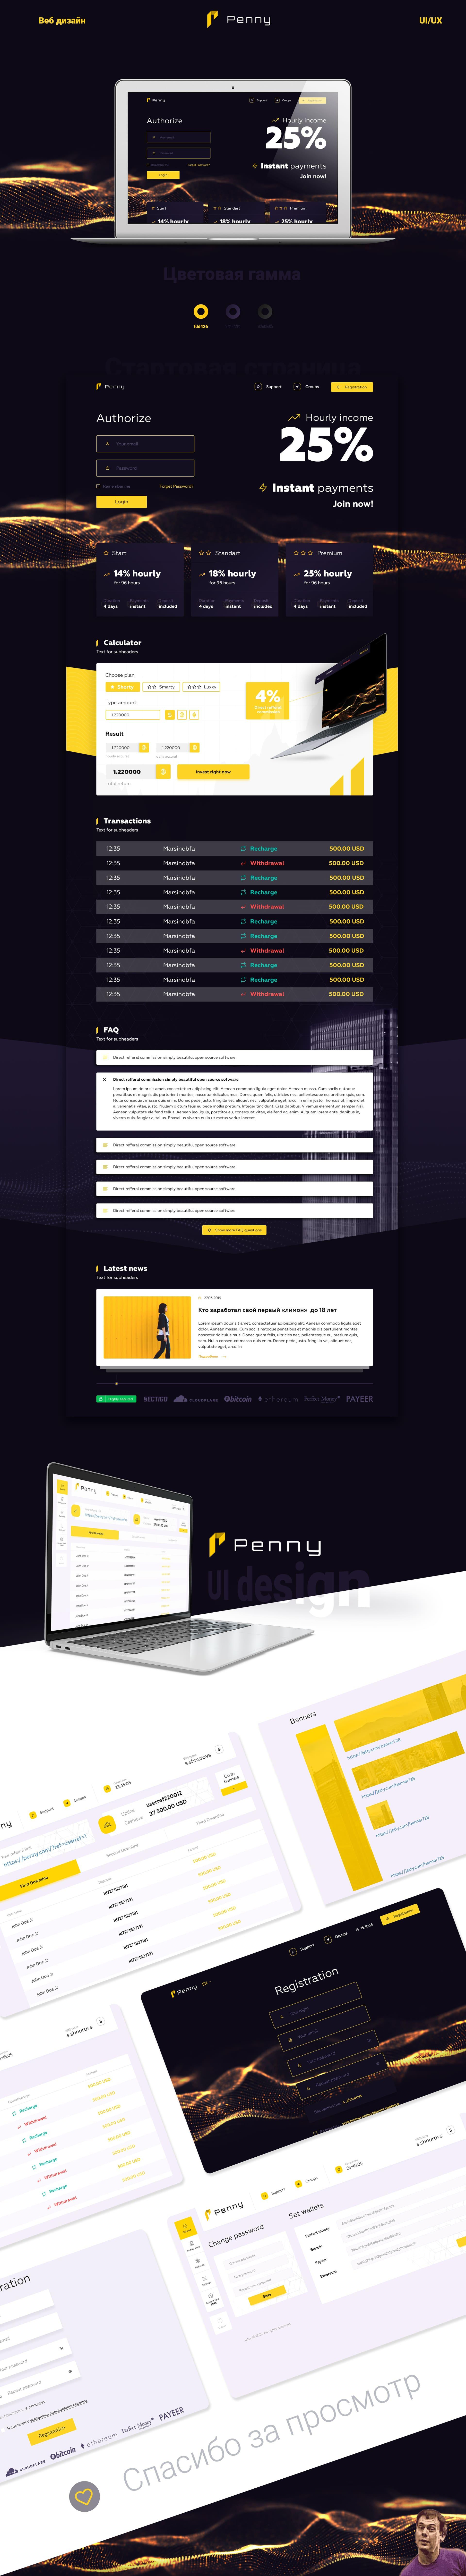 Penny - концепт-дизайн сайта инвестиционного сервиса